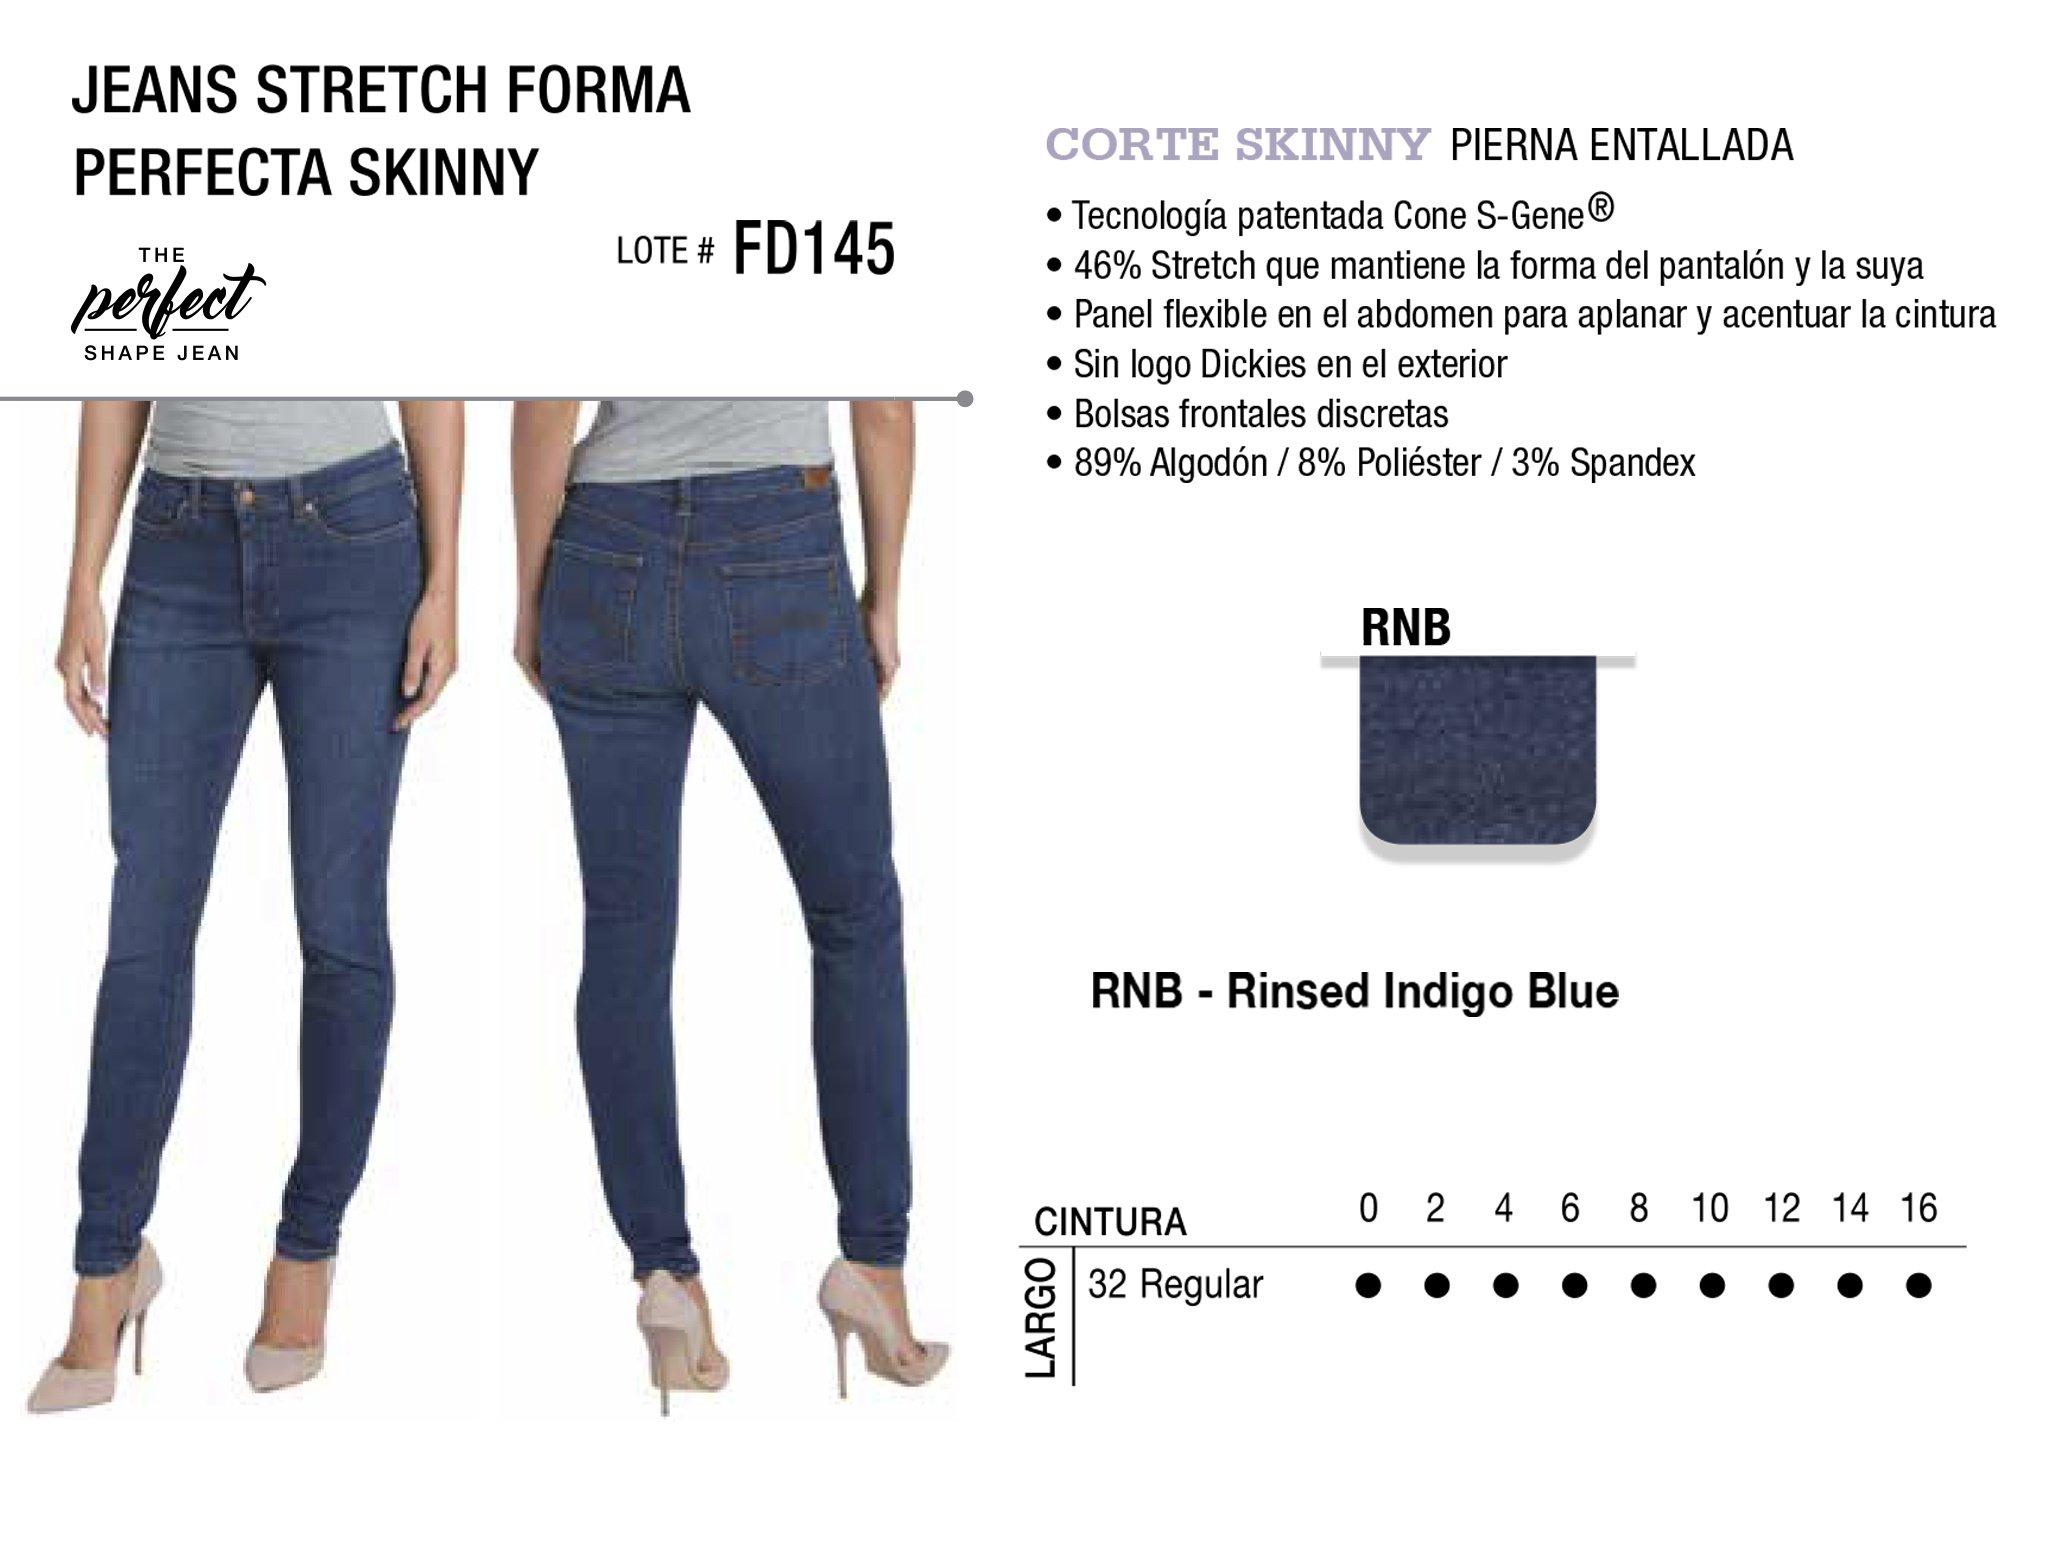 Jeans Stretch Forma Perfecta Skinny. Corte Skinny. FD145.